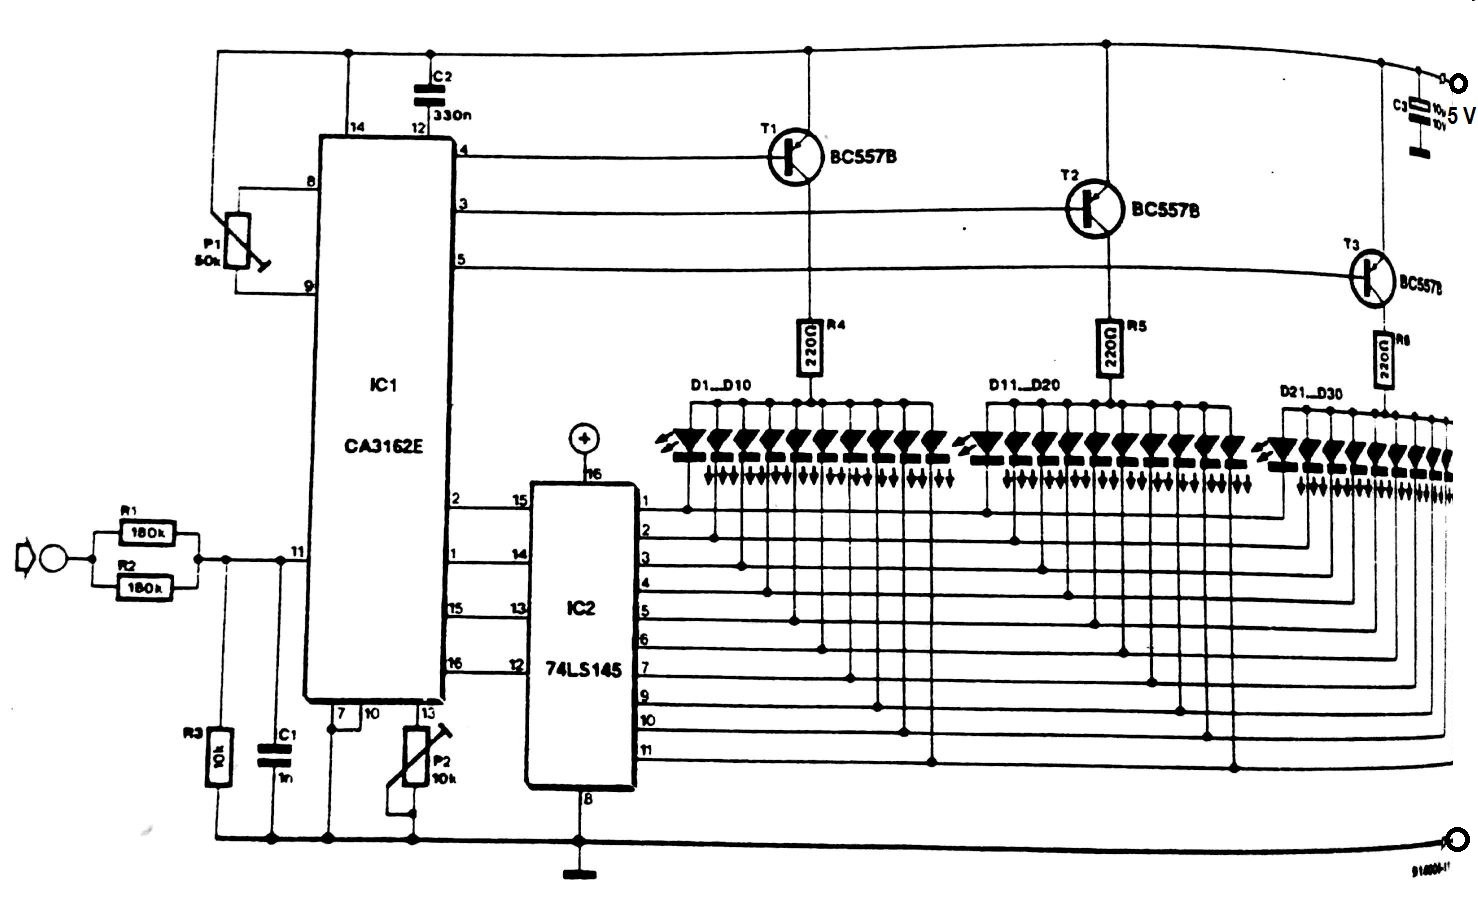 digital voltmeter wiring diagram 1998 jeep grand cherokee infinity stereo led circuit